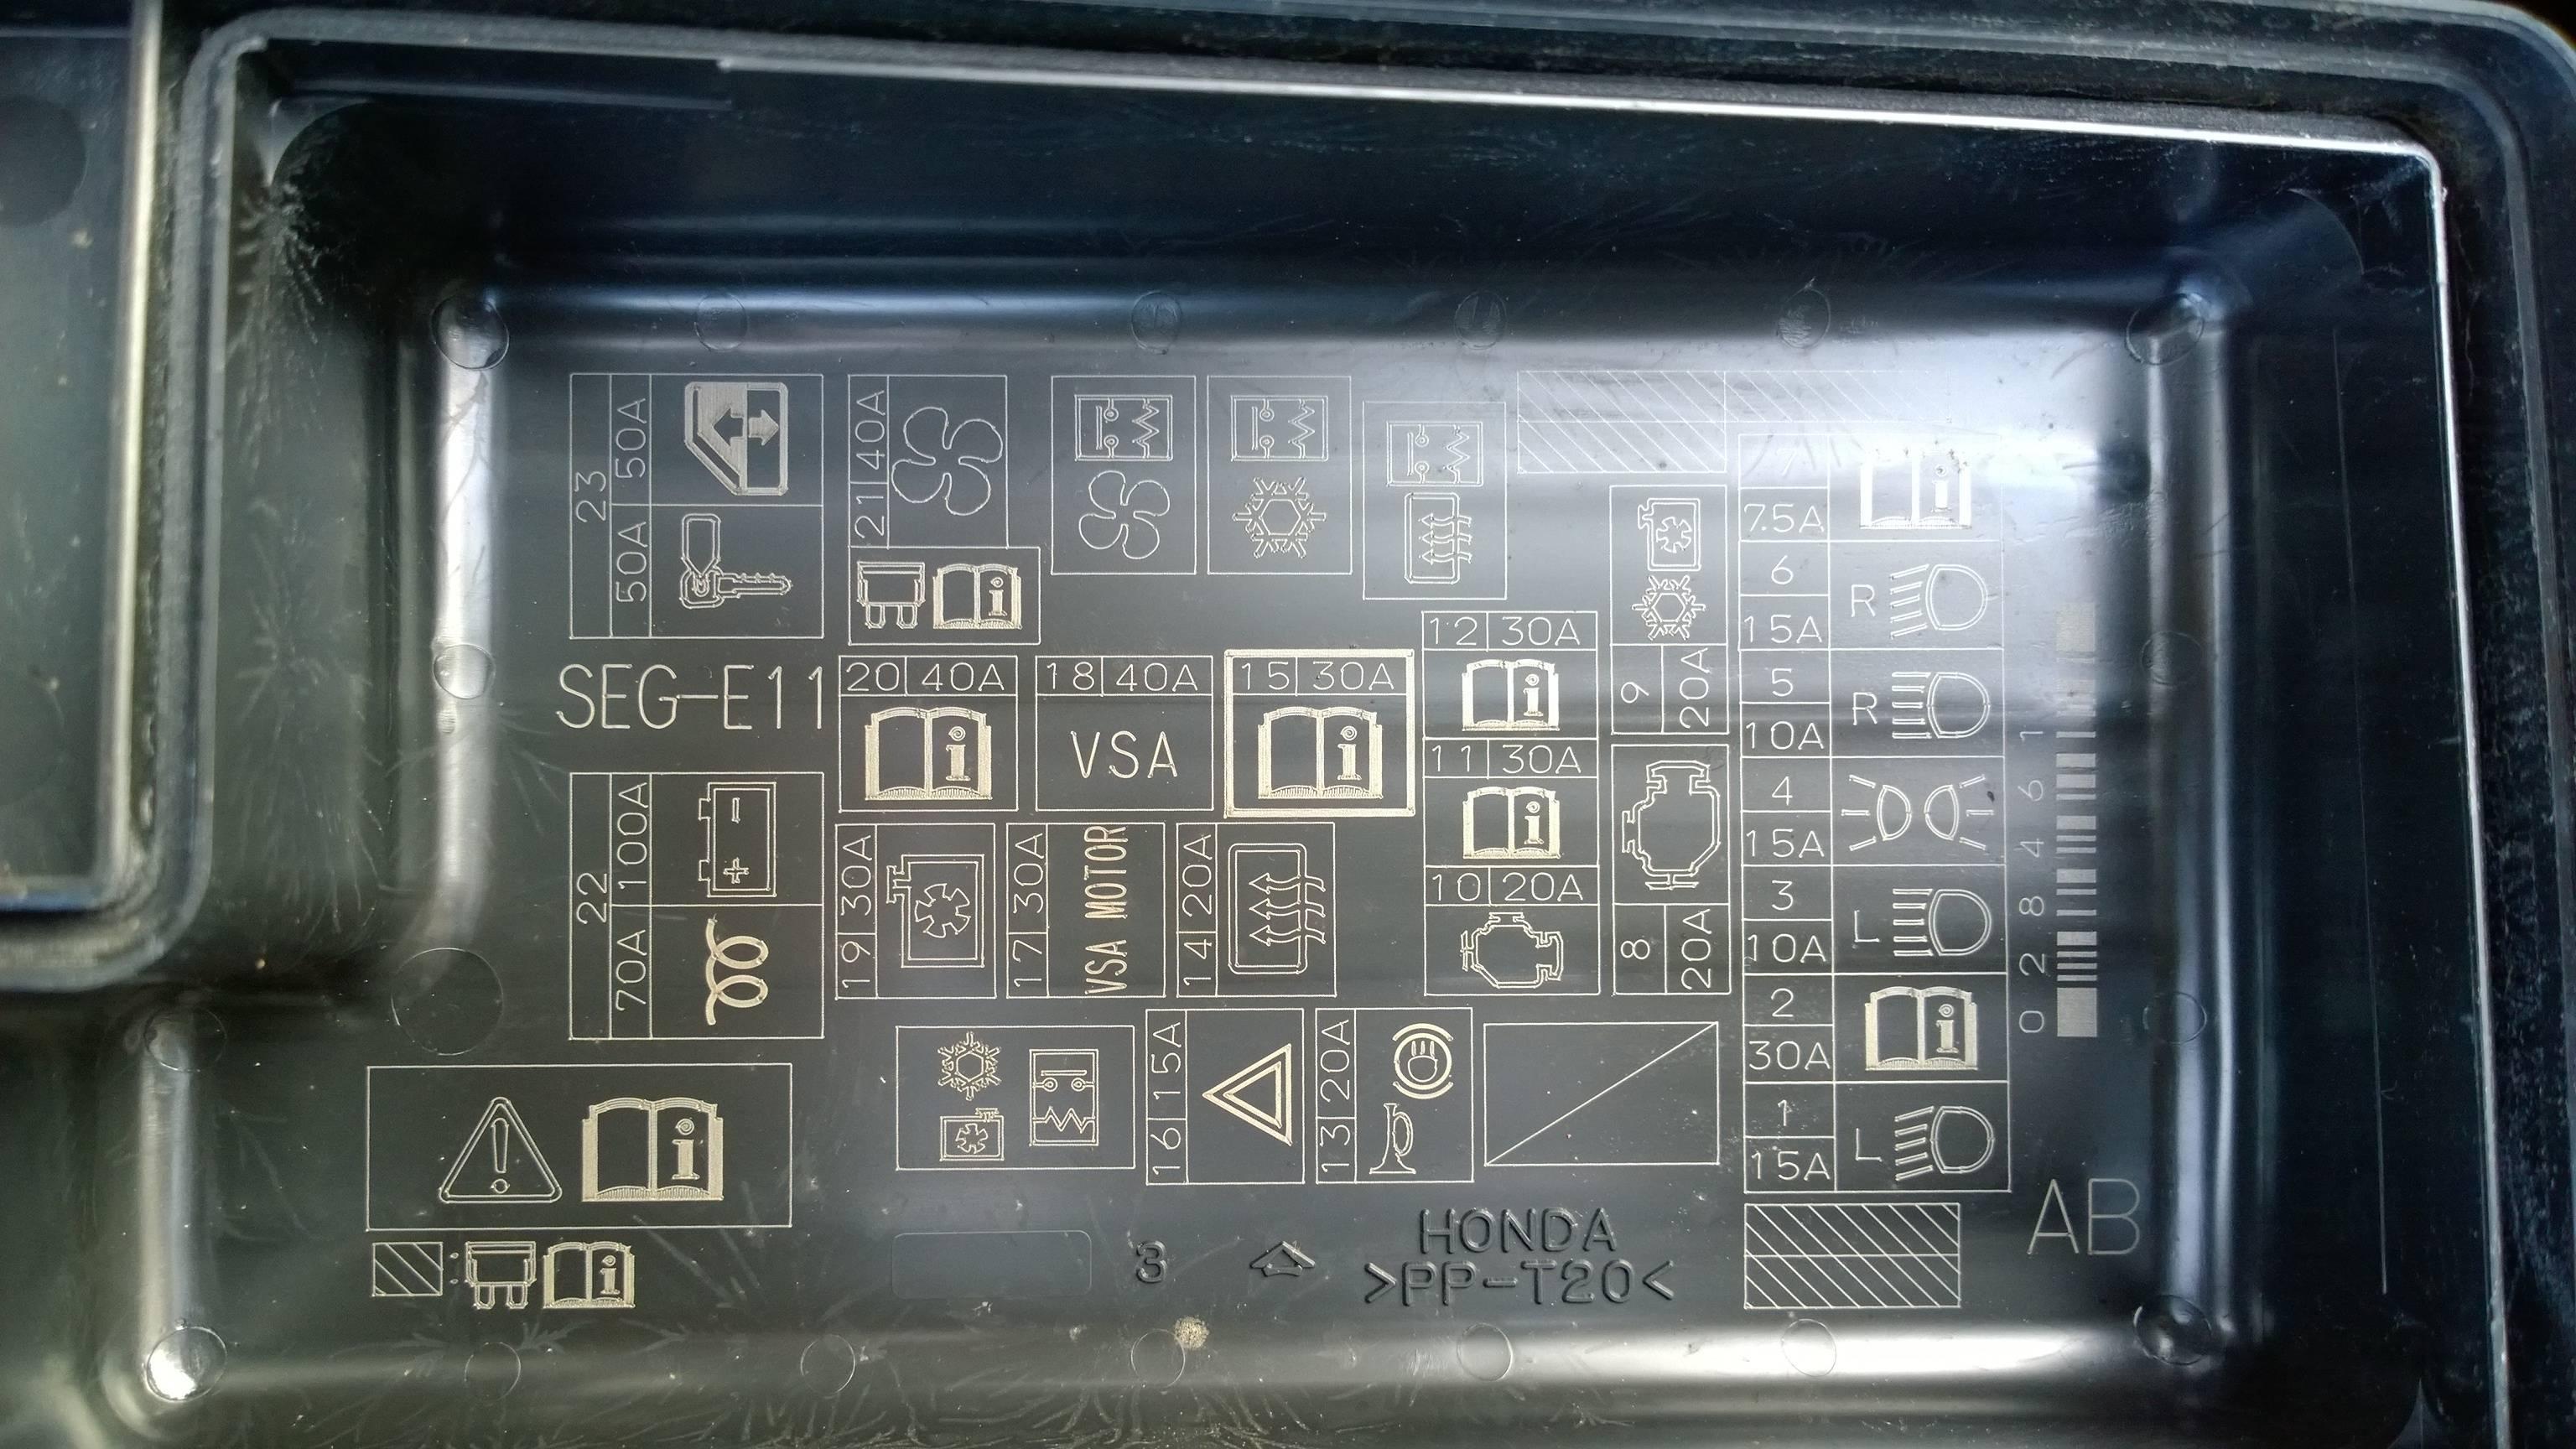 2005 Honda Accord Fuse Box Diagram 2005 Accord Fuse Box Wiring Diagram Information